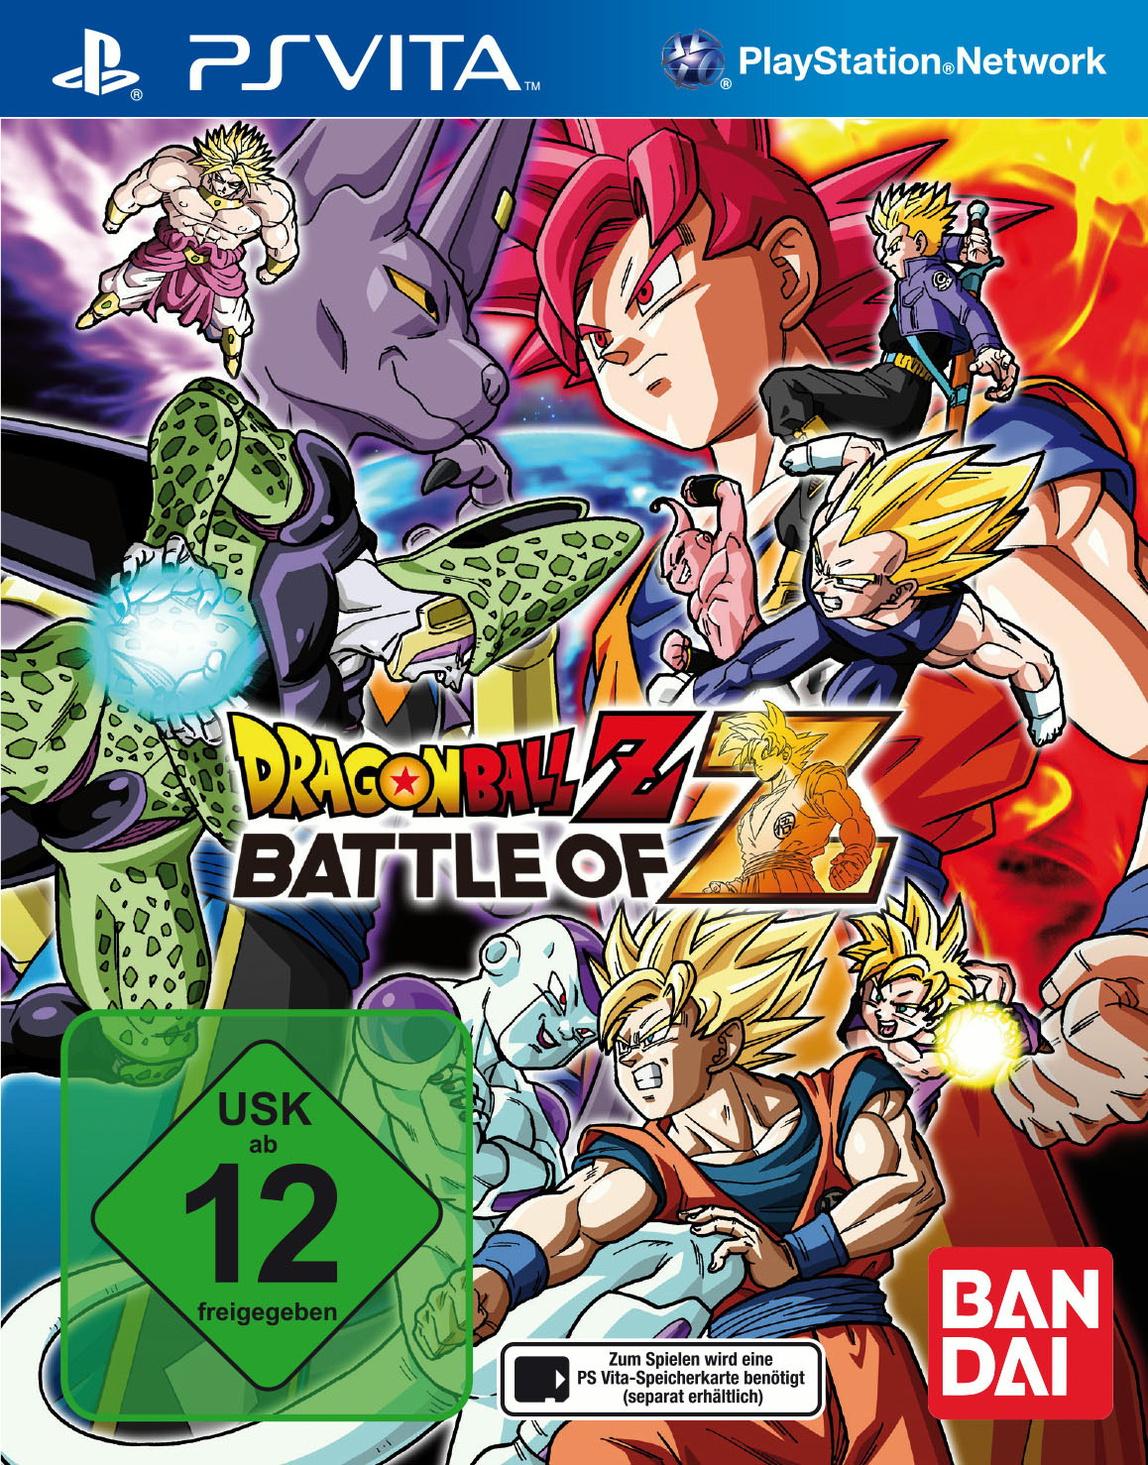 Dragon Ball Z: Battle of Z [D1 Edition]